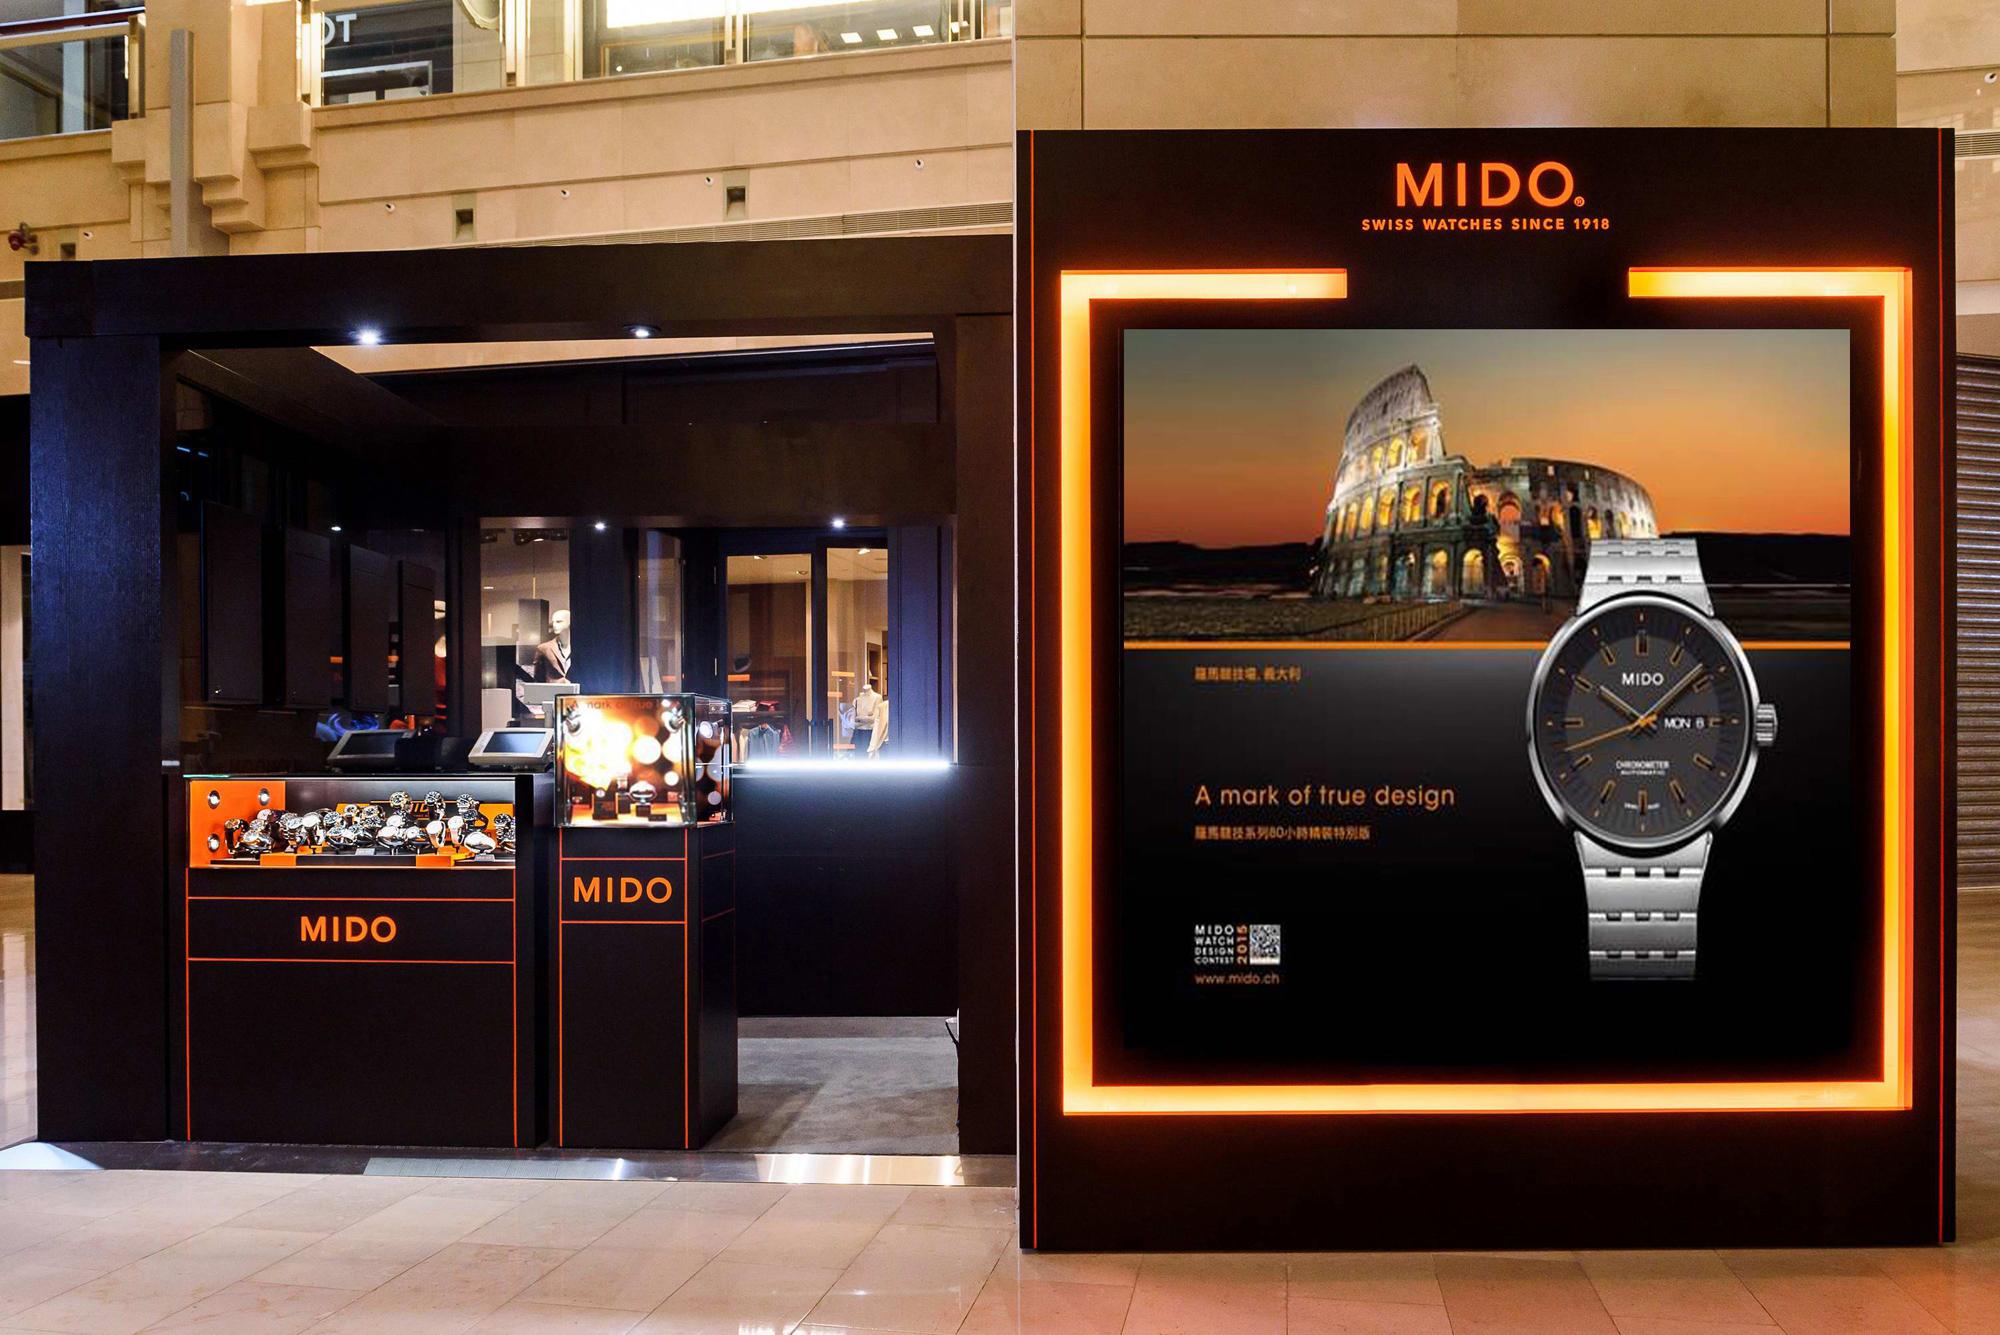 MIDO美度表台北101專賣店後方的大型錶款形象廣告,霸氣十足。